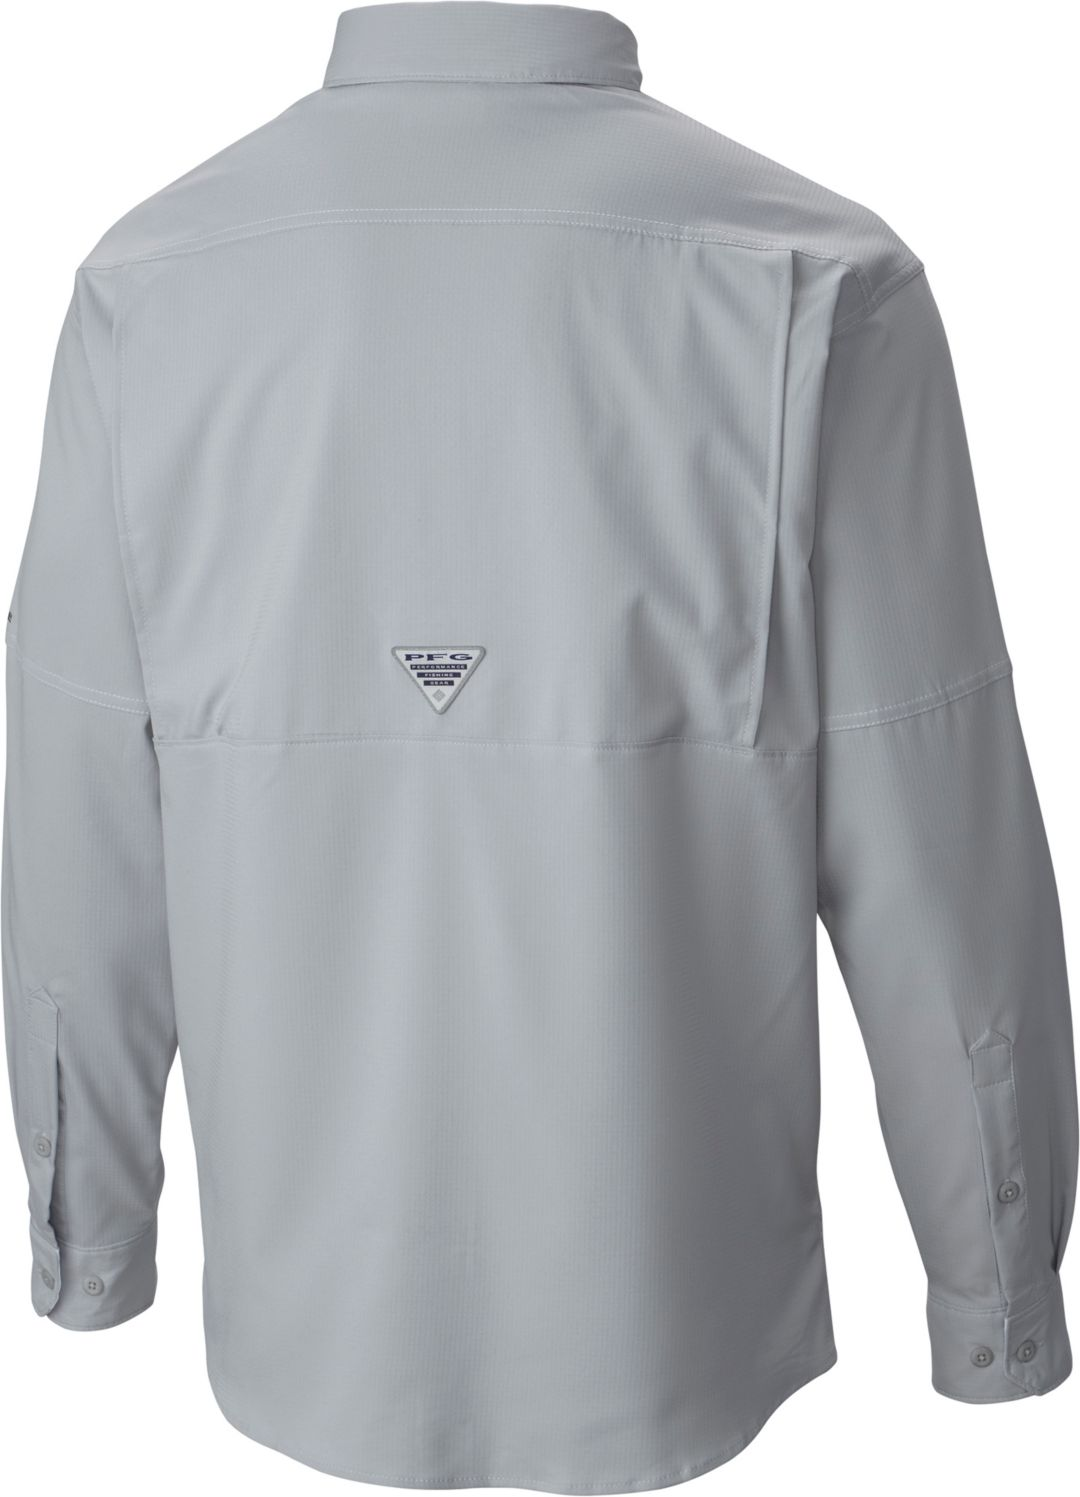 91847b7676d Columbia Men's PFG Low Drag Offshore Long Sleeve Shirt   DICK'S ...